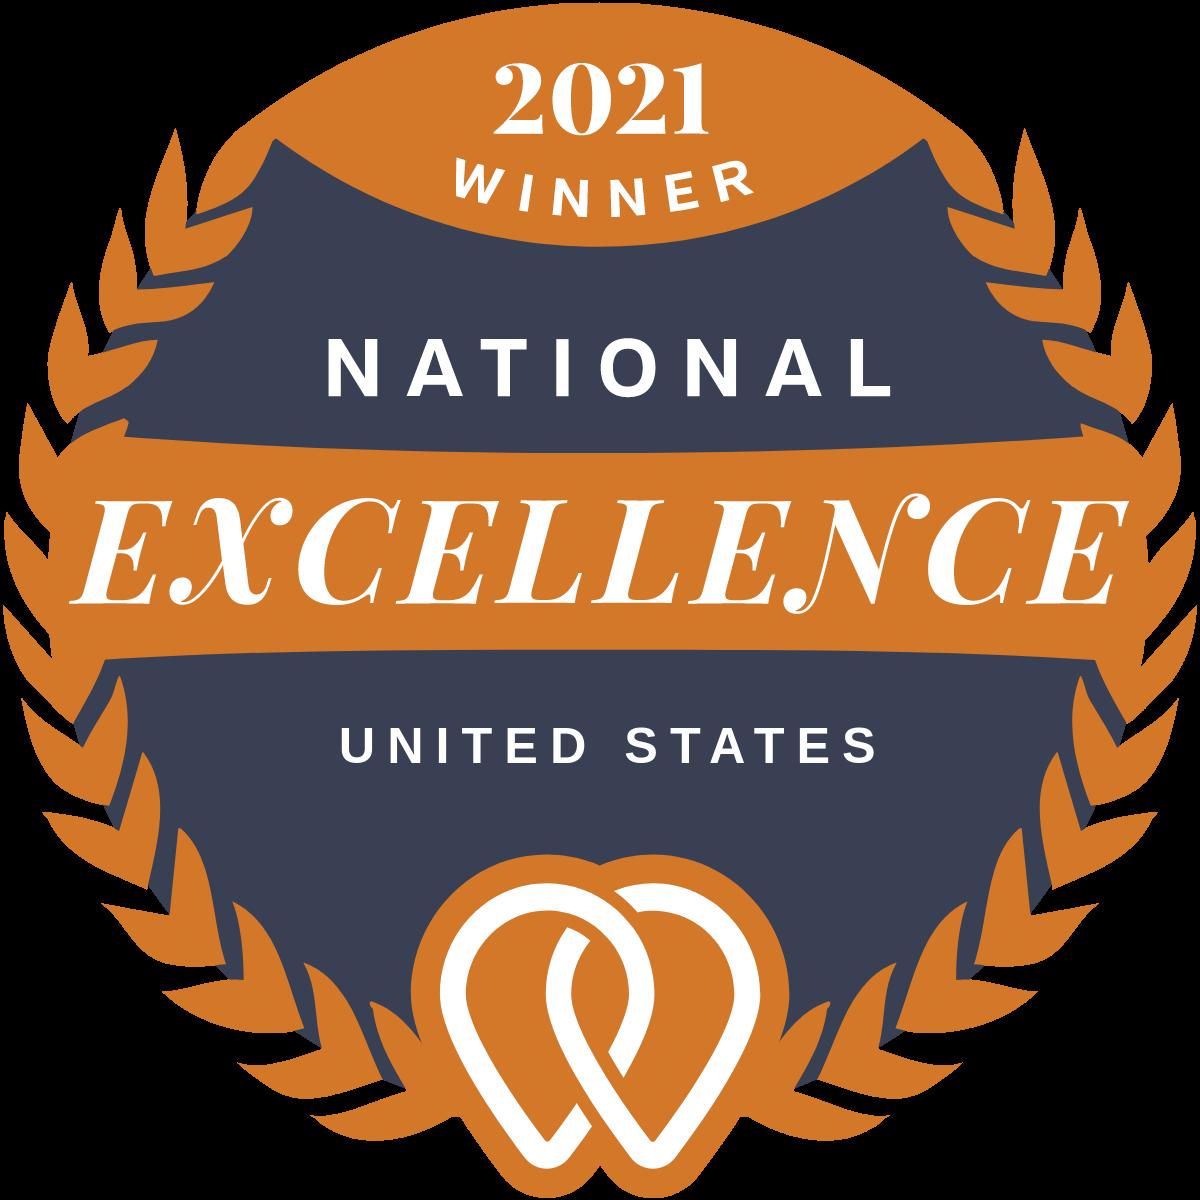 NITRO PLUG Digital Marketing UpCity National Excellence Award Winner!